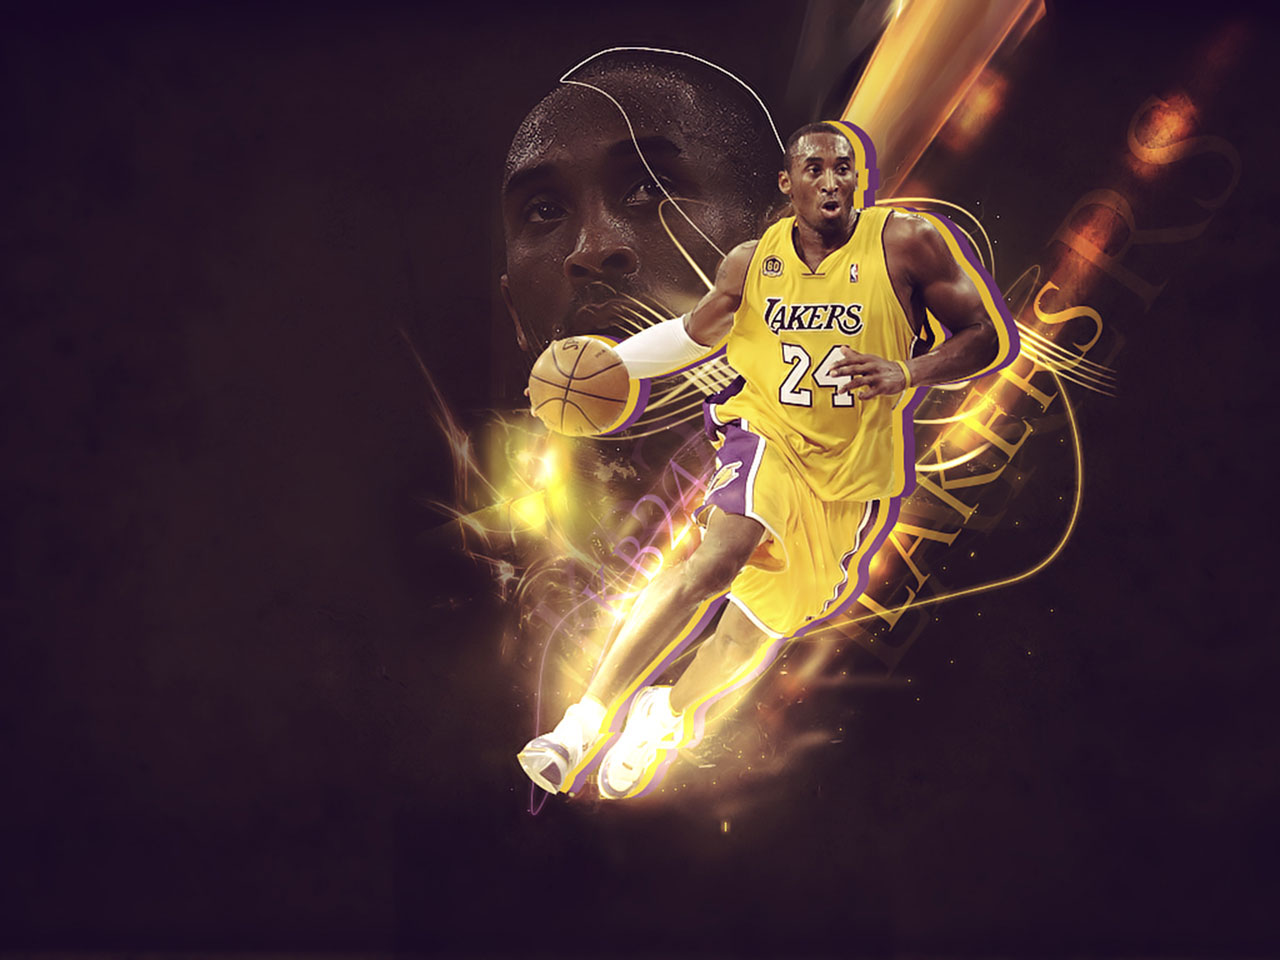 Kobe Bryant Wallpapaper Big Fan of NBA   Daily Update 1280x960